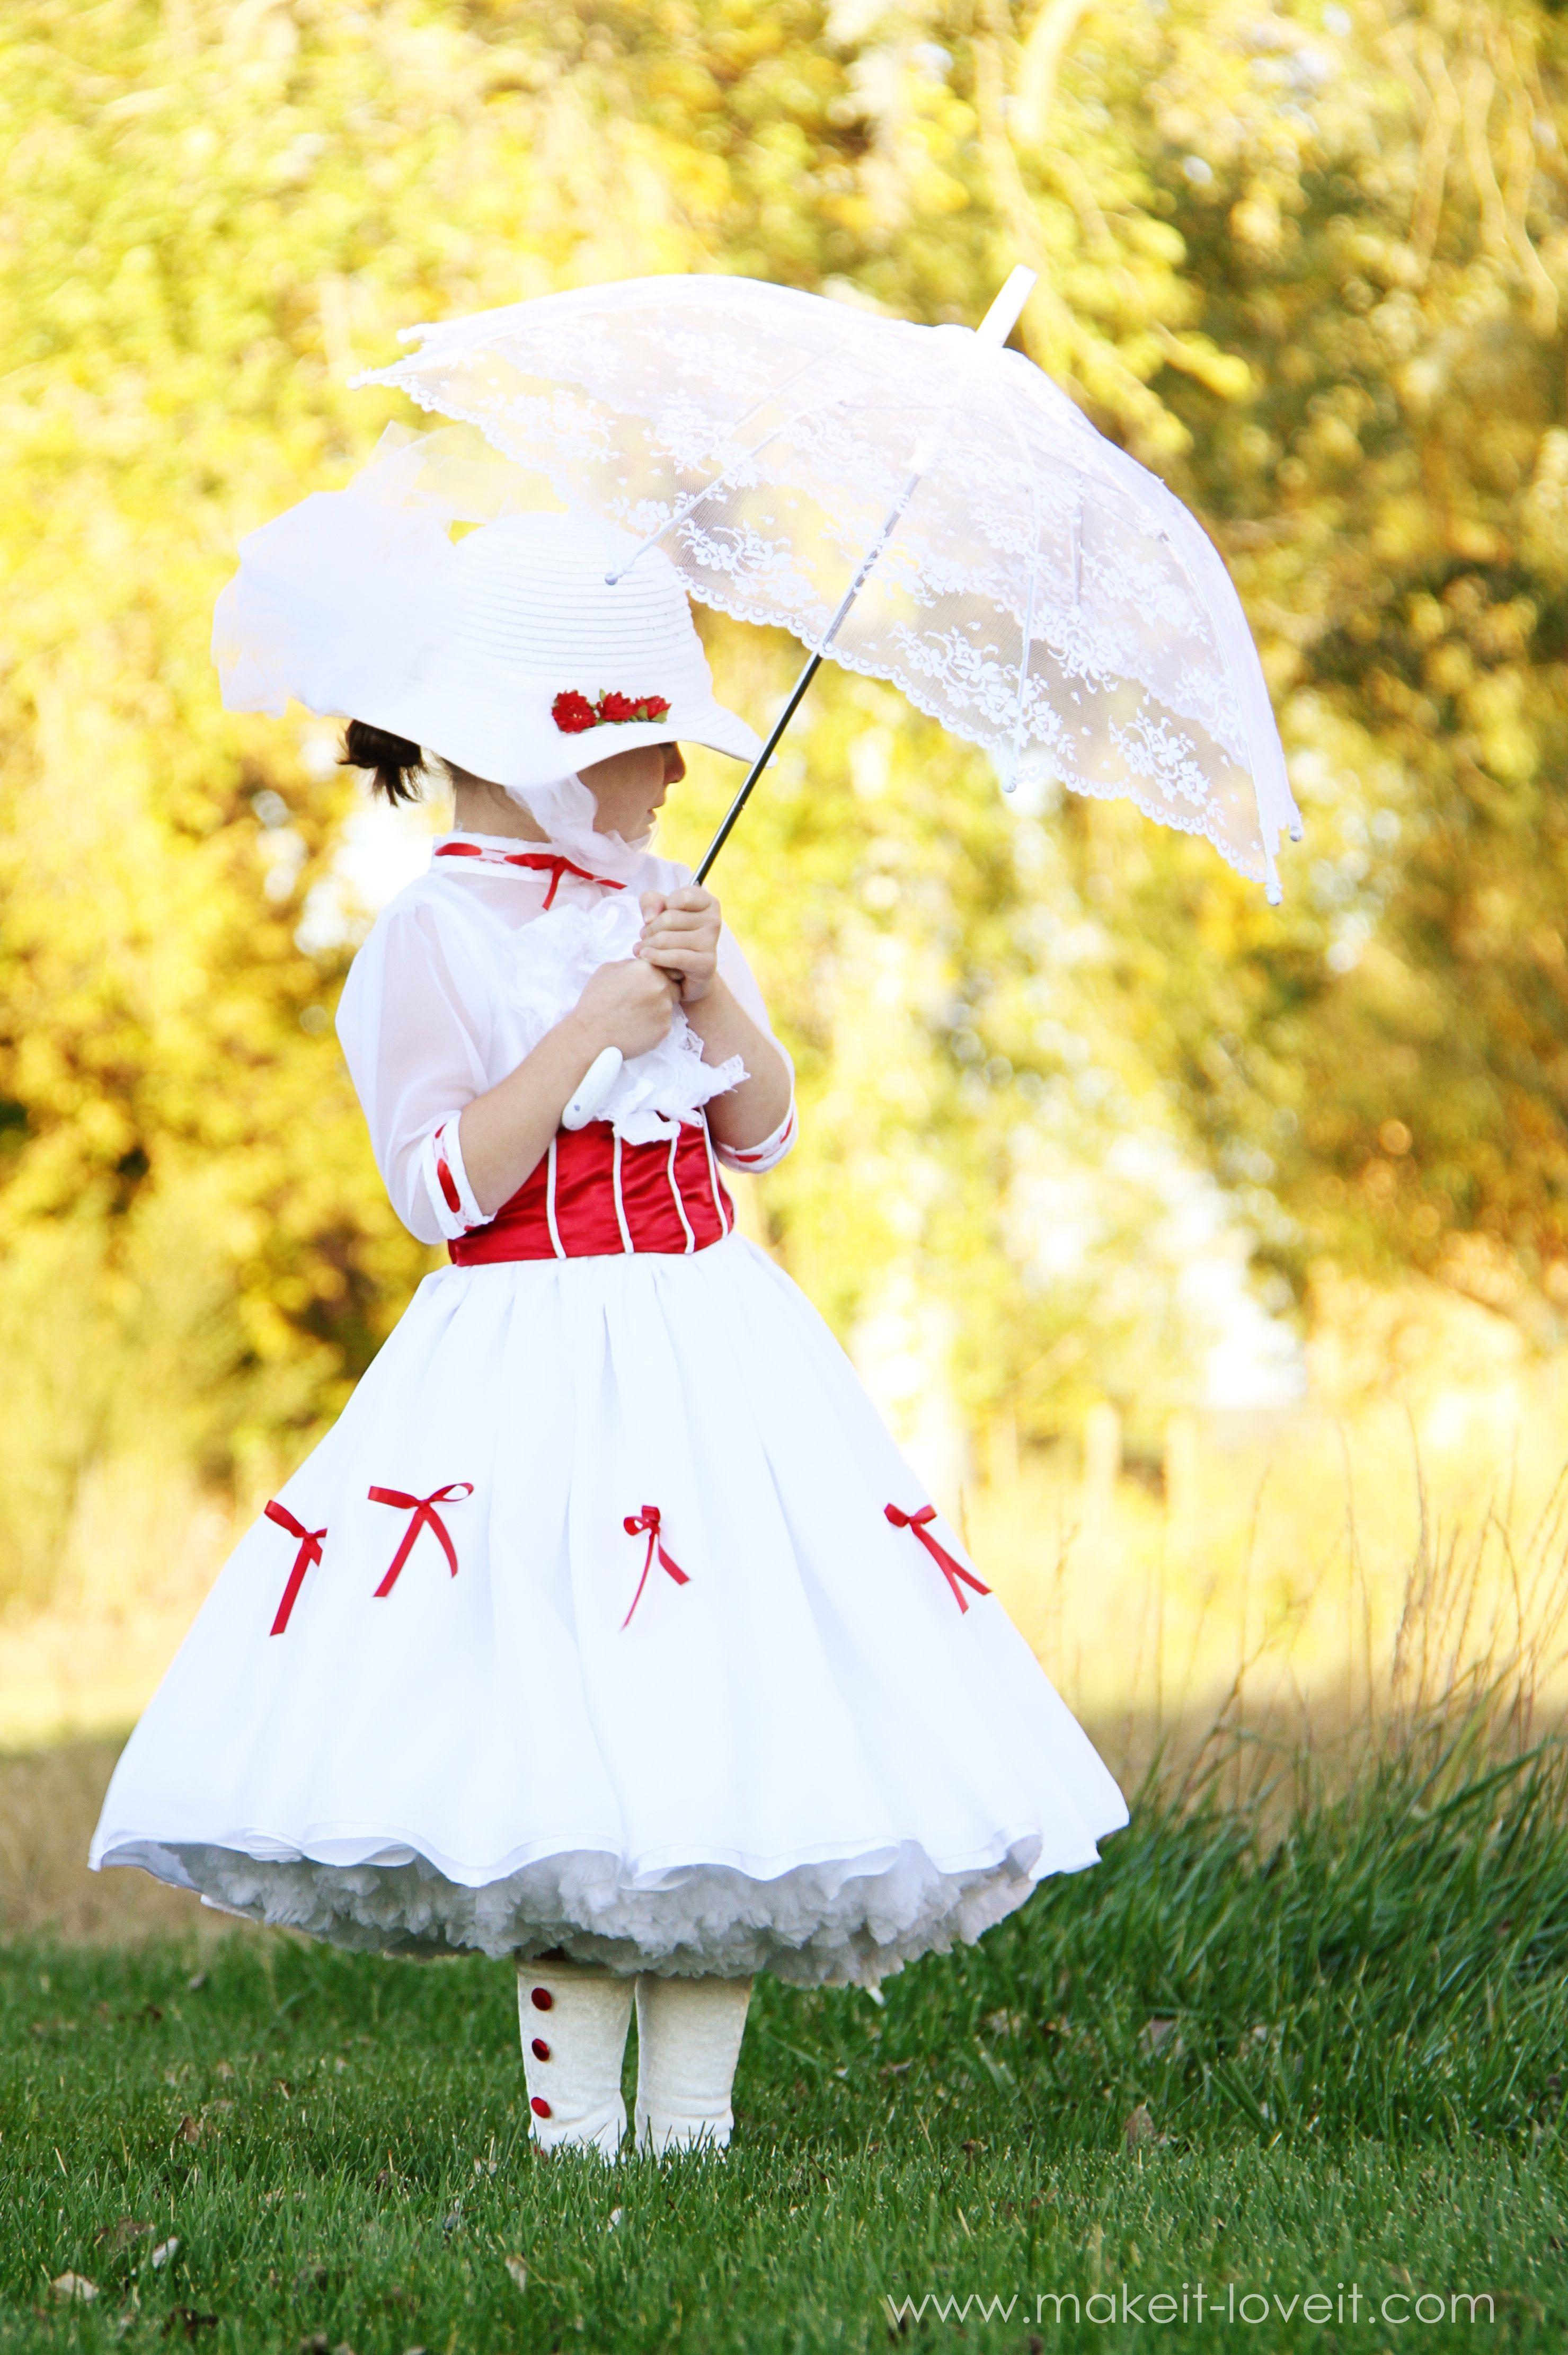 Diy Mary Poppins Costume For Halloween Halloween Pinterest Disfraz Niño Disfraces Niños Y Bebe